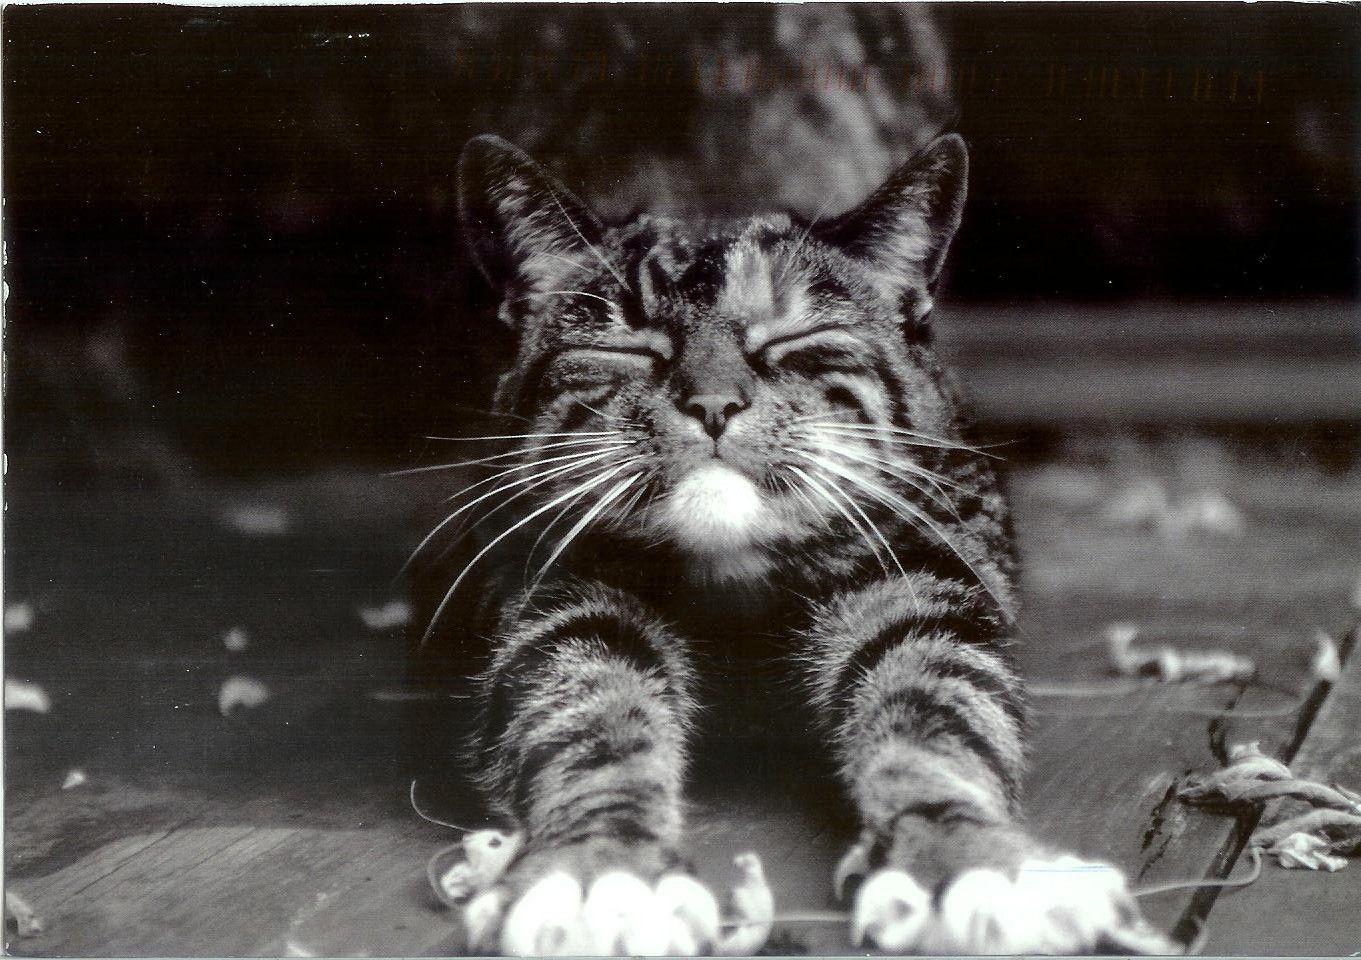 Cat Stretching Cat stretching, Cats, Cat heaven